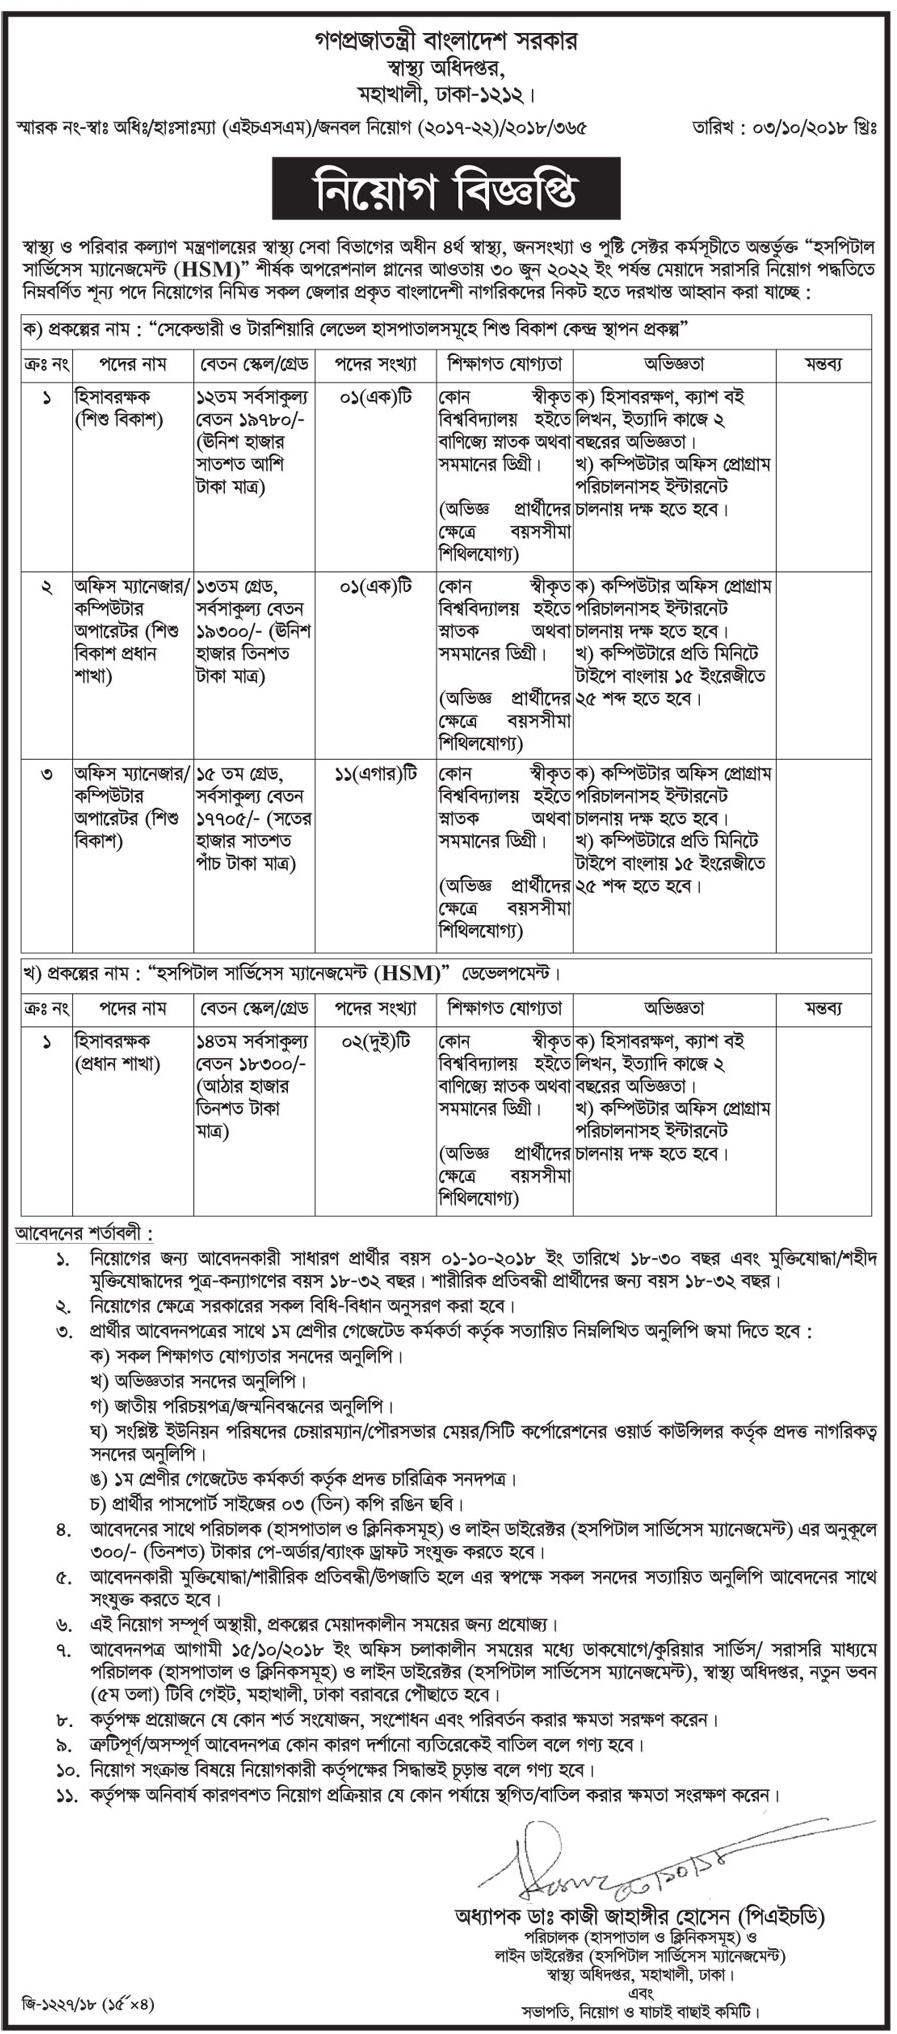 Ministry of Health & Family Welfare MOHFW Job Circular 2018